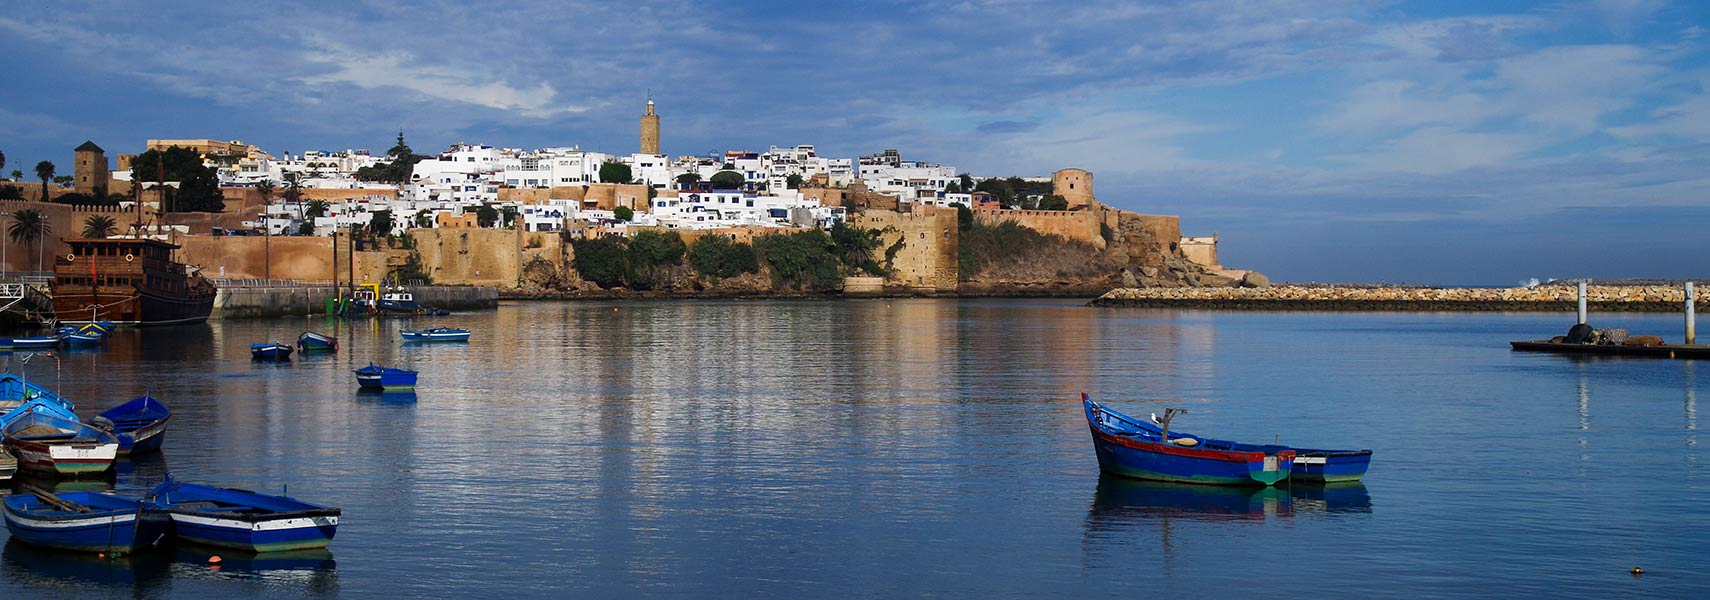 Morocco المغرب